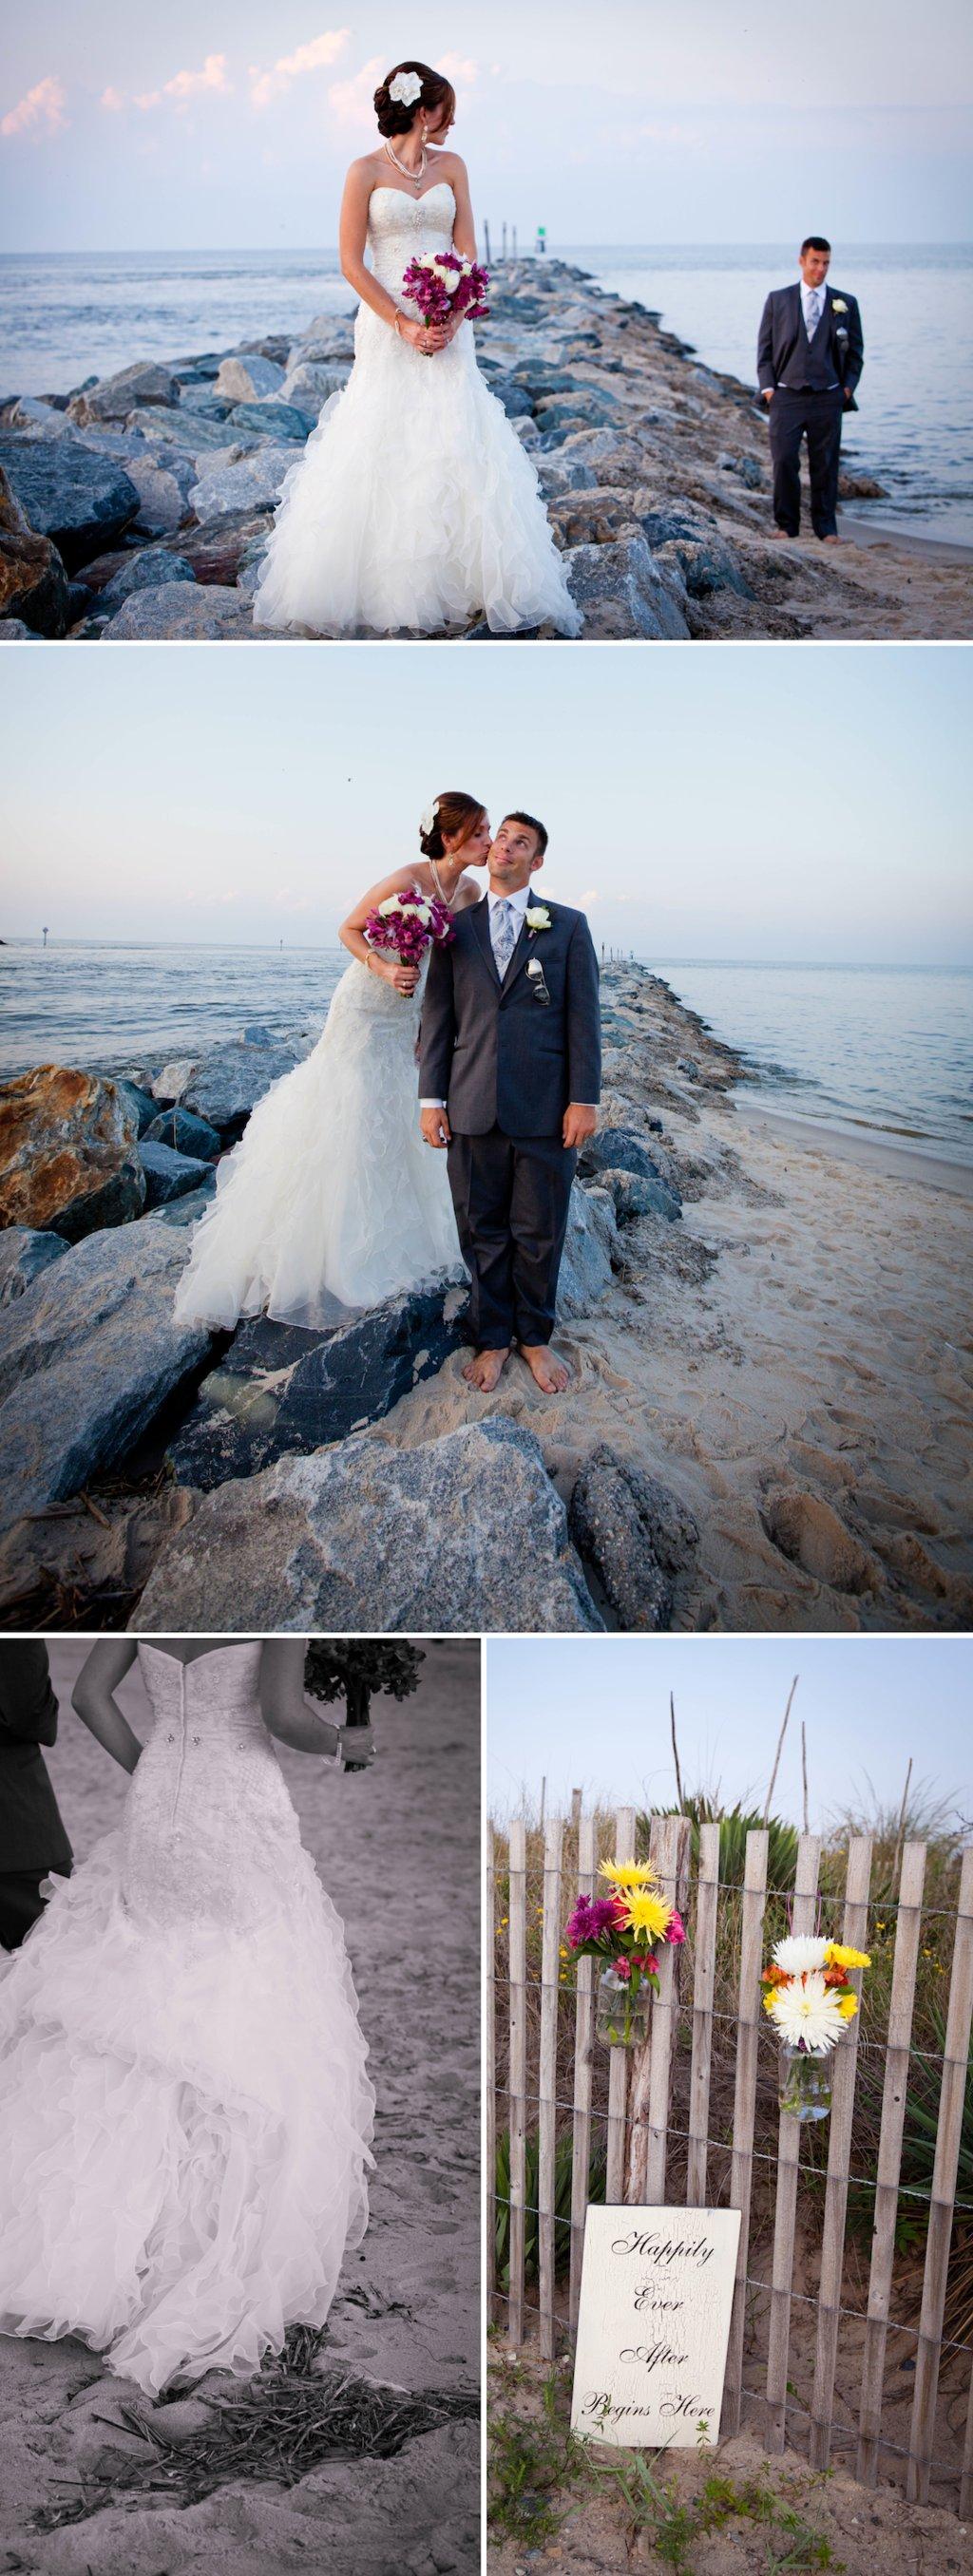 Beach-wedding-in-deleware-rustic-backdrop-wedding-party-photos-3.full